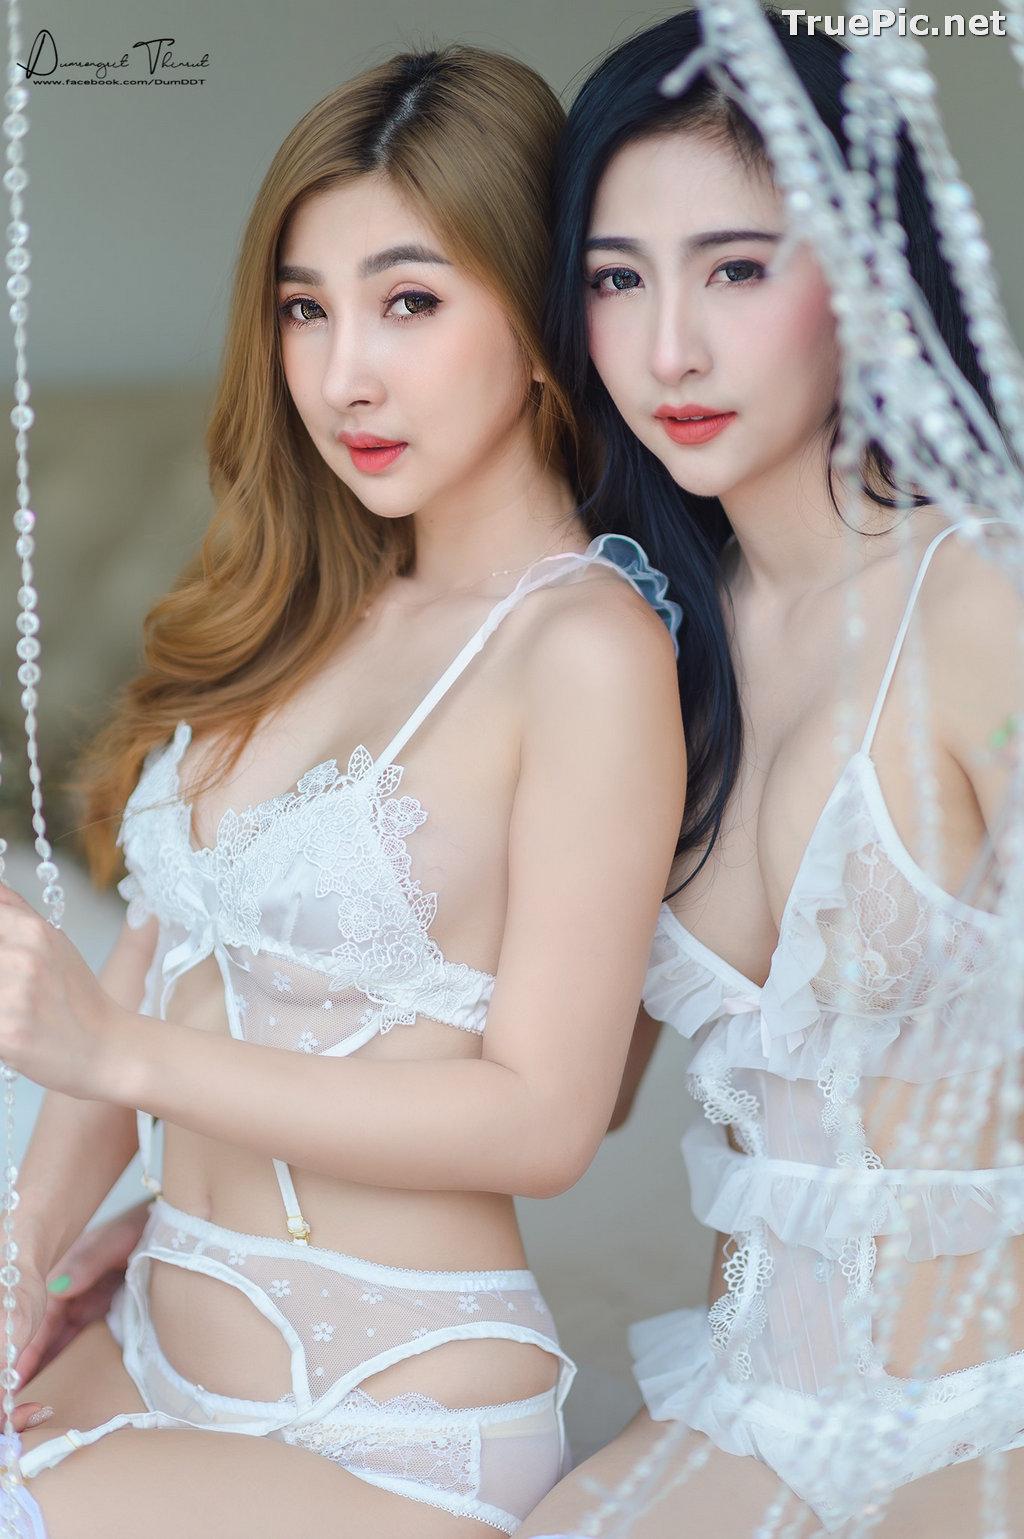 Image Thailand Model - Pattamaporn Keawkum & Anita Bunpan - Girls & Light - TruePic.net - Picture-5